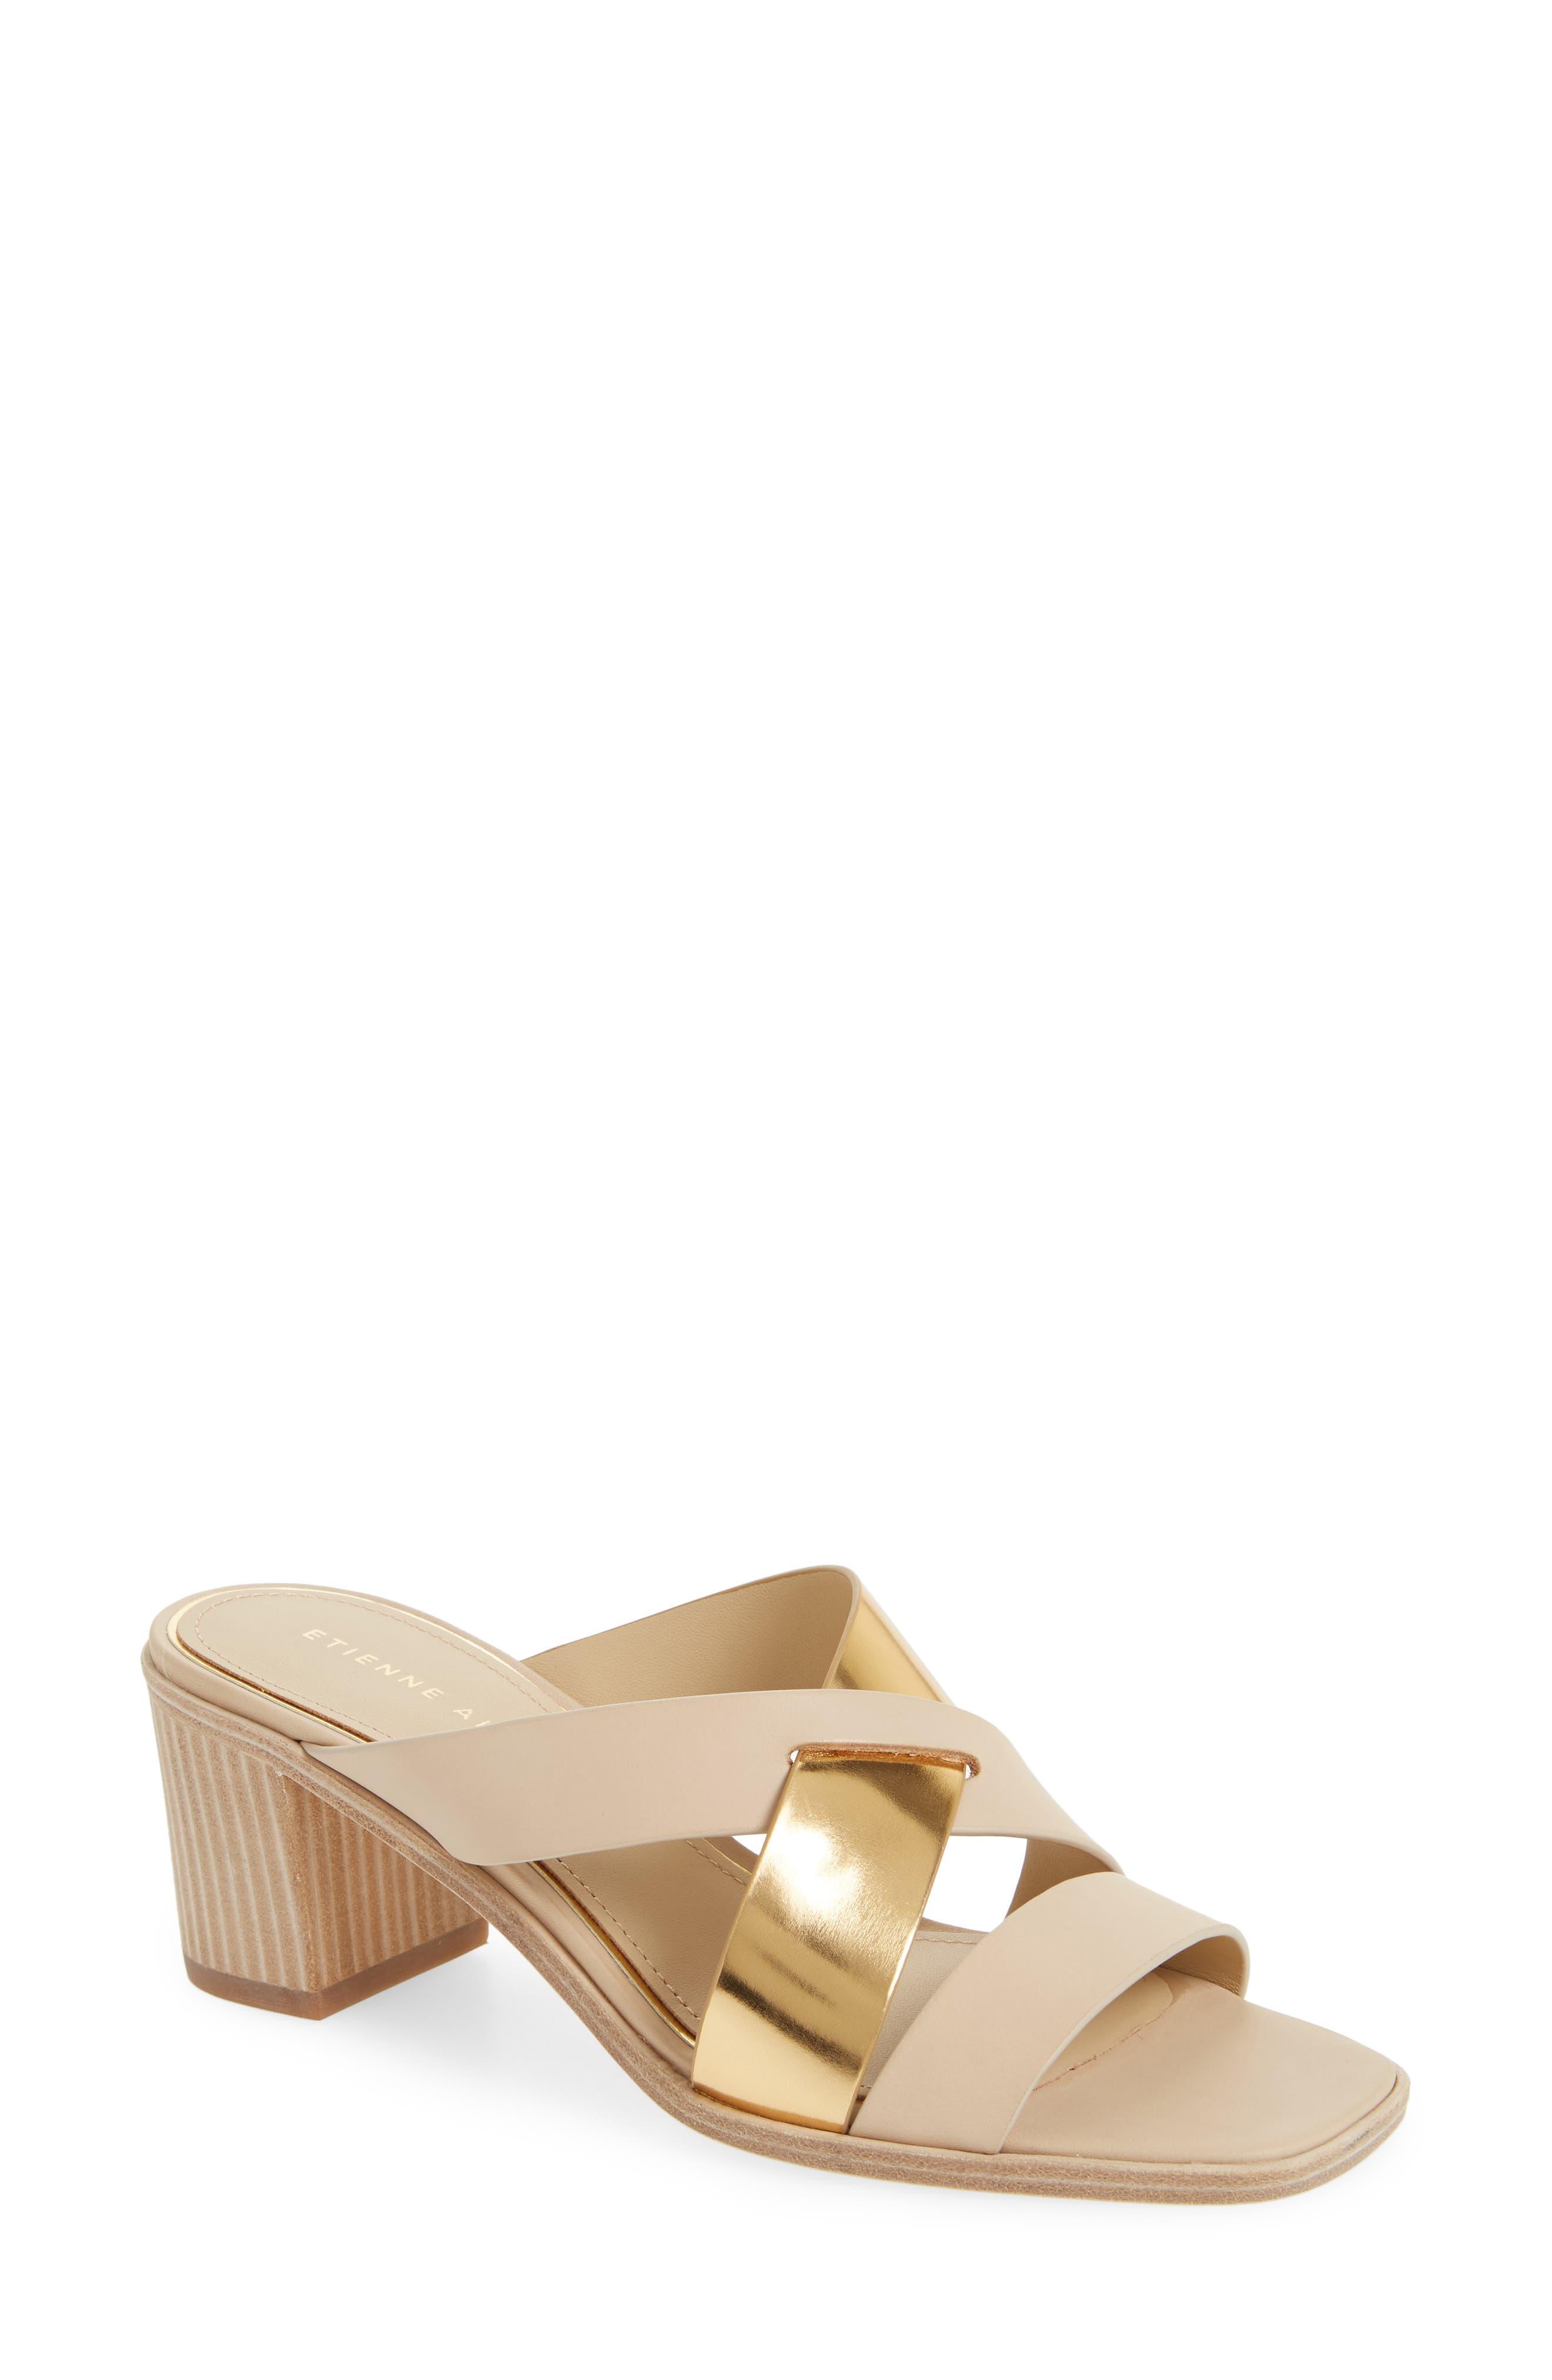 Exclusive Women Athena Alexander Belyze Wedge Sandal Beige - C8Y4778215